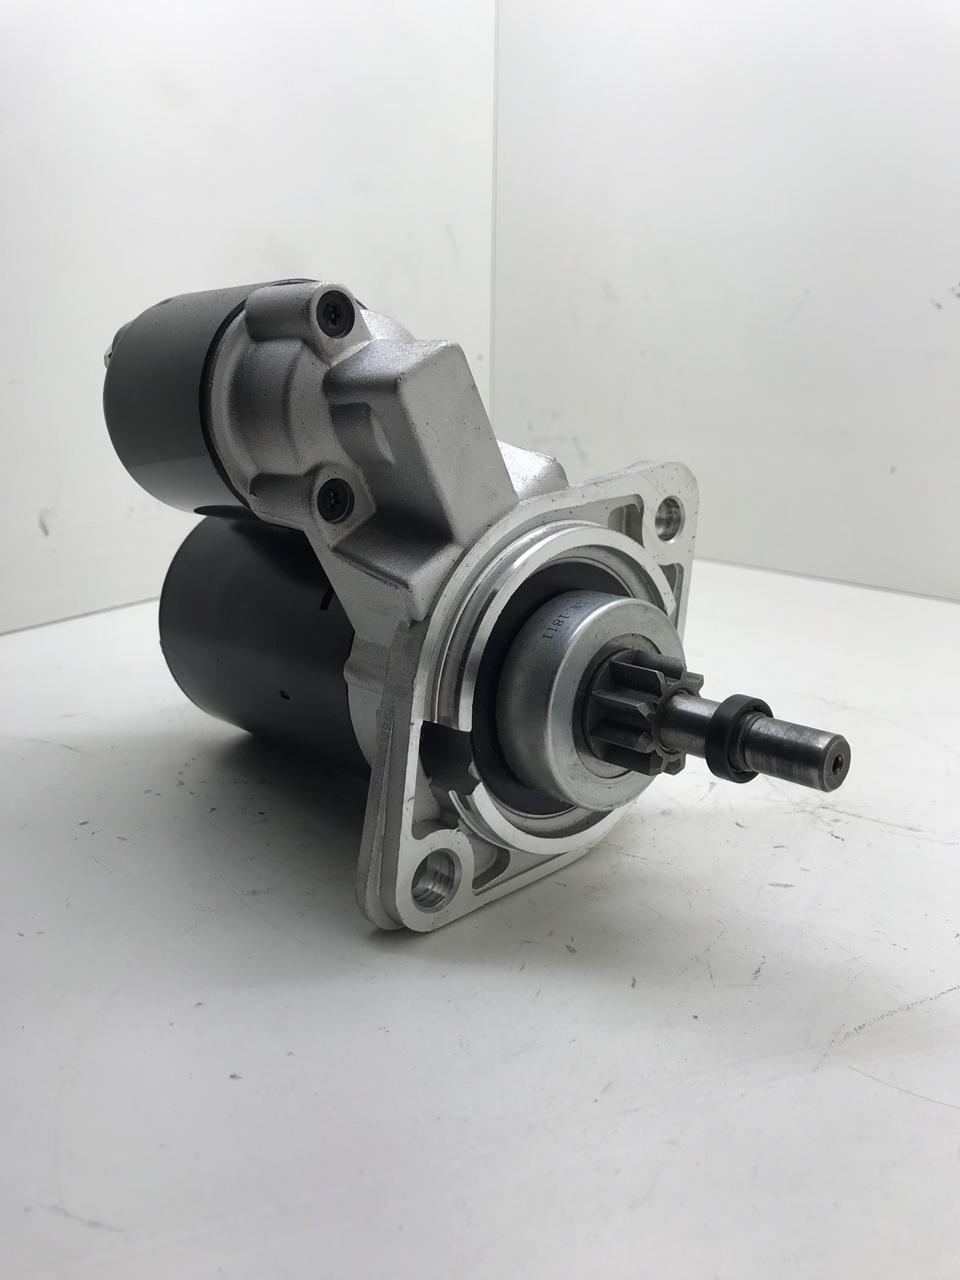 Motor De Arranque Moderno Fusca Kombi Brasilia 1300 1500 1600 Bosch 12v 9 Dentes F000alo306 Rd11001